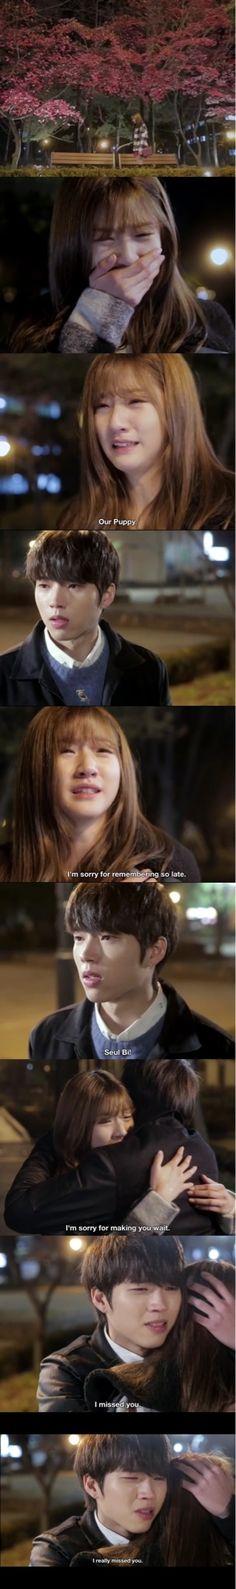 😭😭😭😭i so cried at this part! Korean Drama Movies, Korean Dramas, Hi School Love On, High Shool, Best Kdrama, Nam Woo Hyun, Lee Sung, Asian Actors, Popular Culture